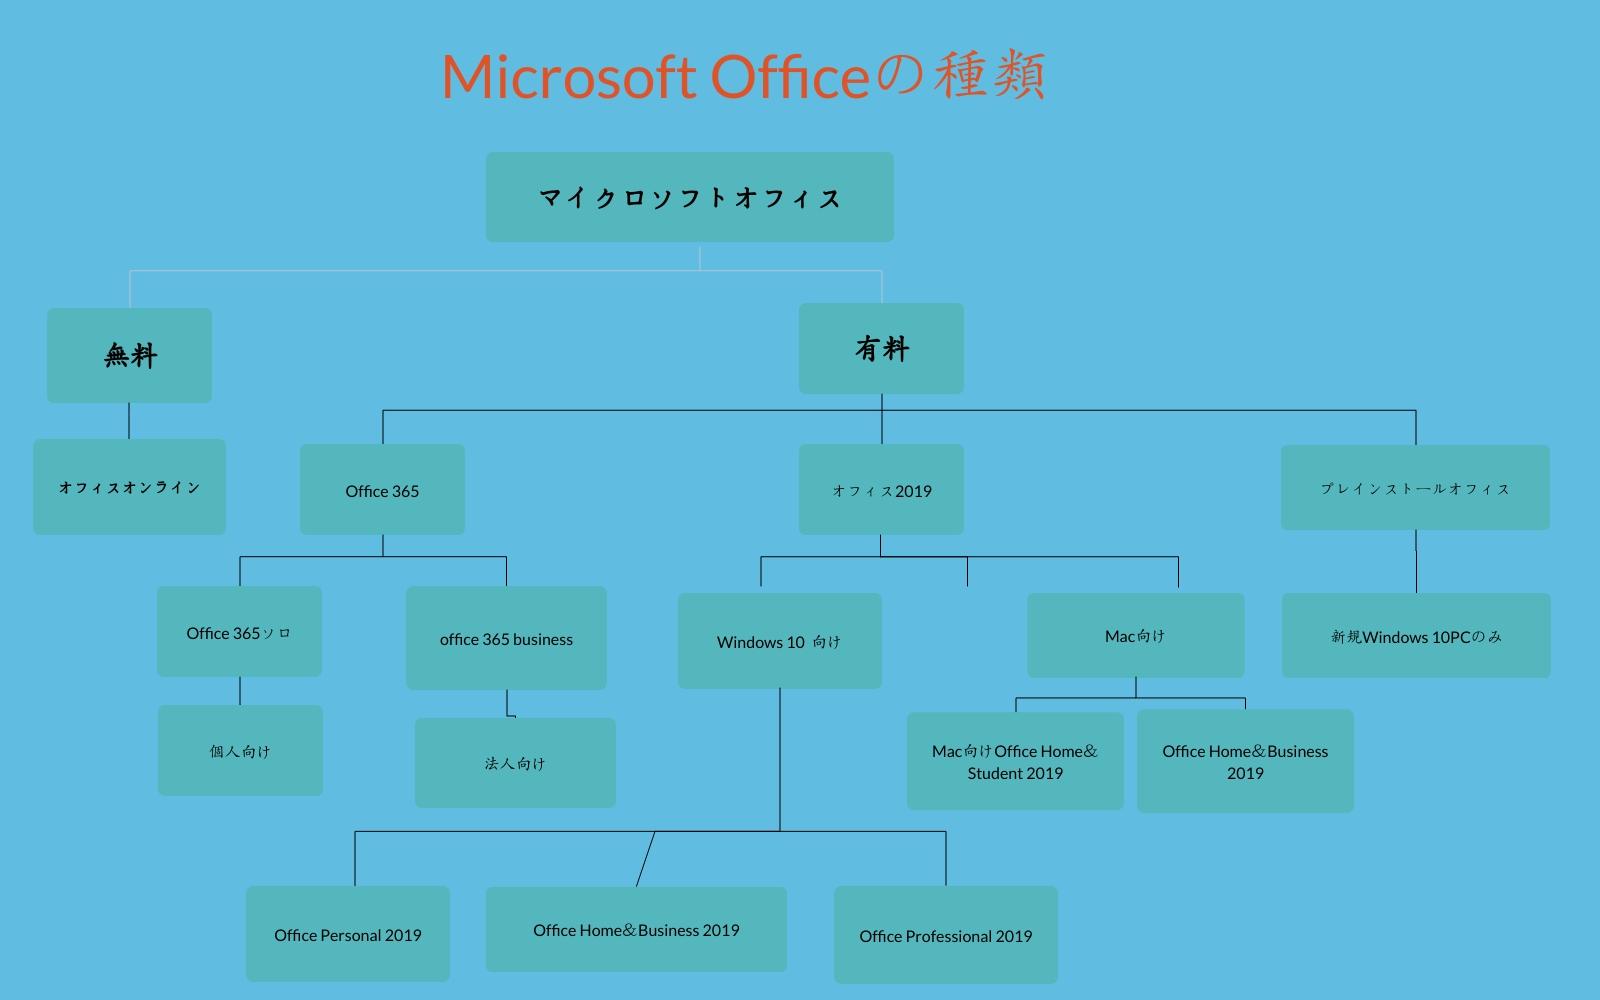 Microsoft Office の種類